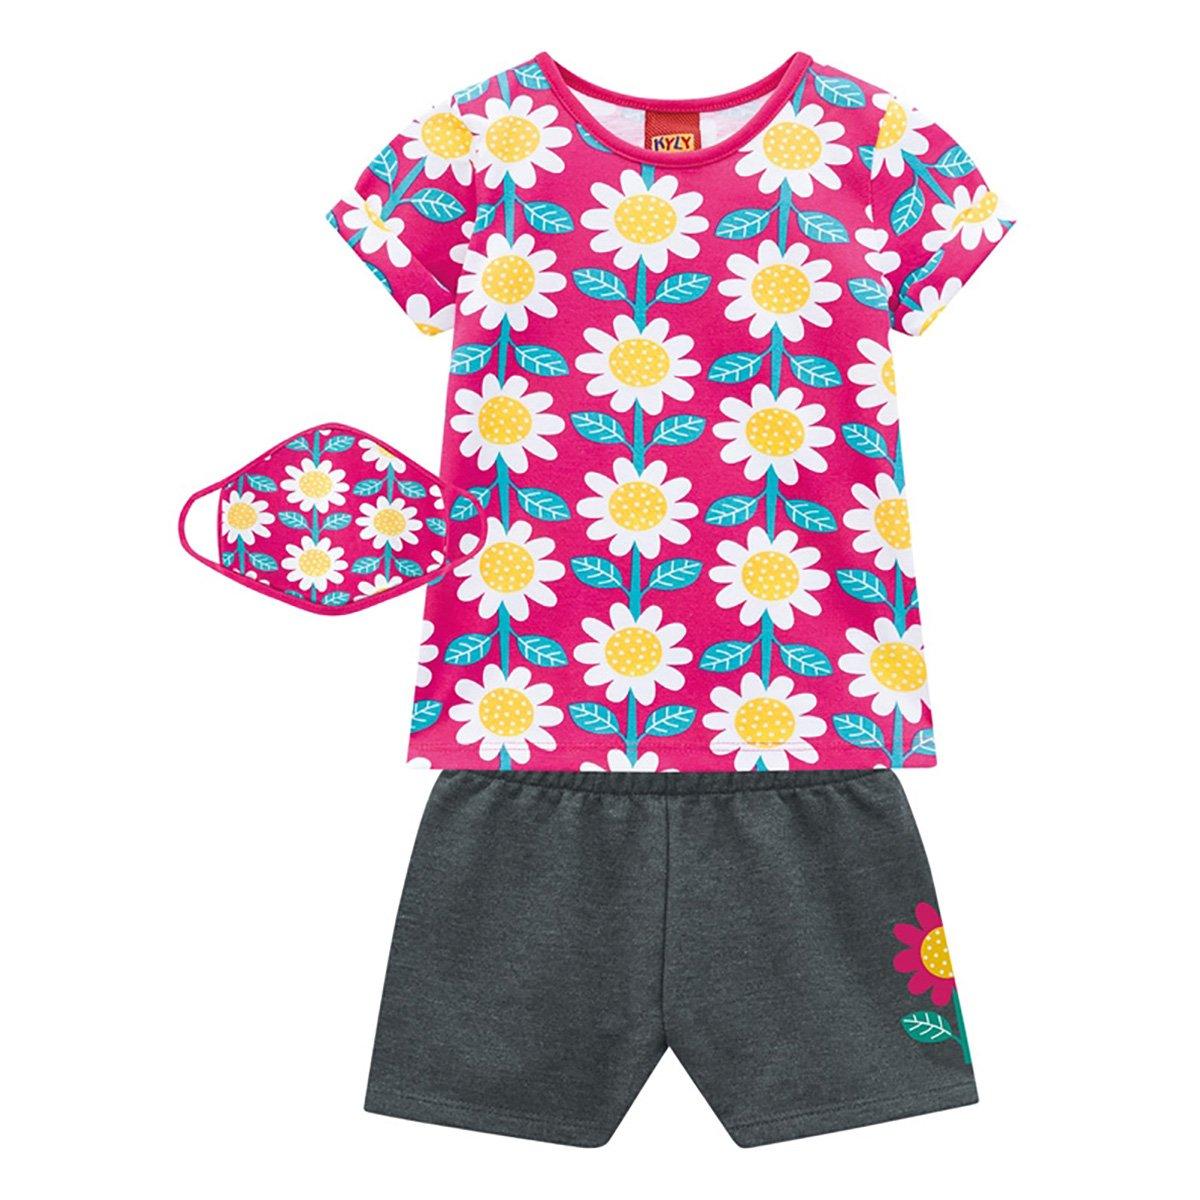 Conjunto Bebê Kyly Camiseta Flores + Shorts c/ Máscara Feminino